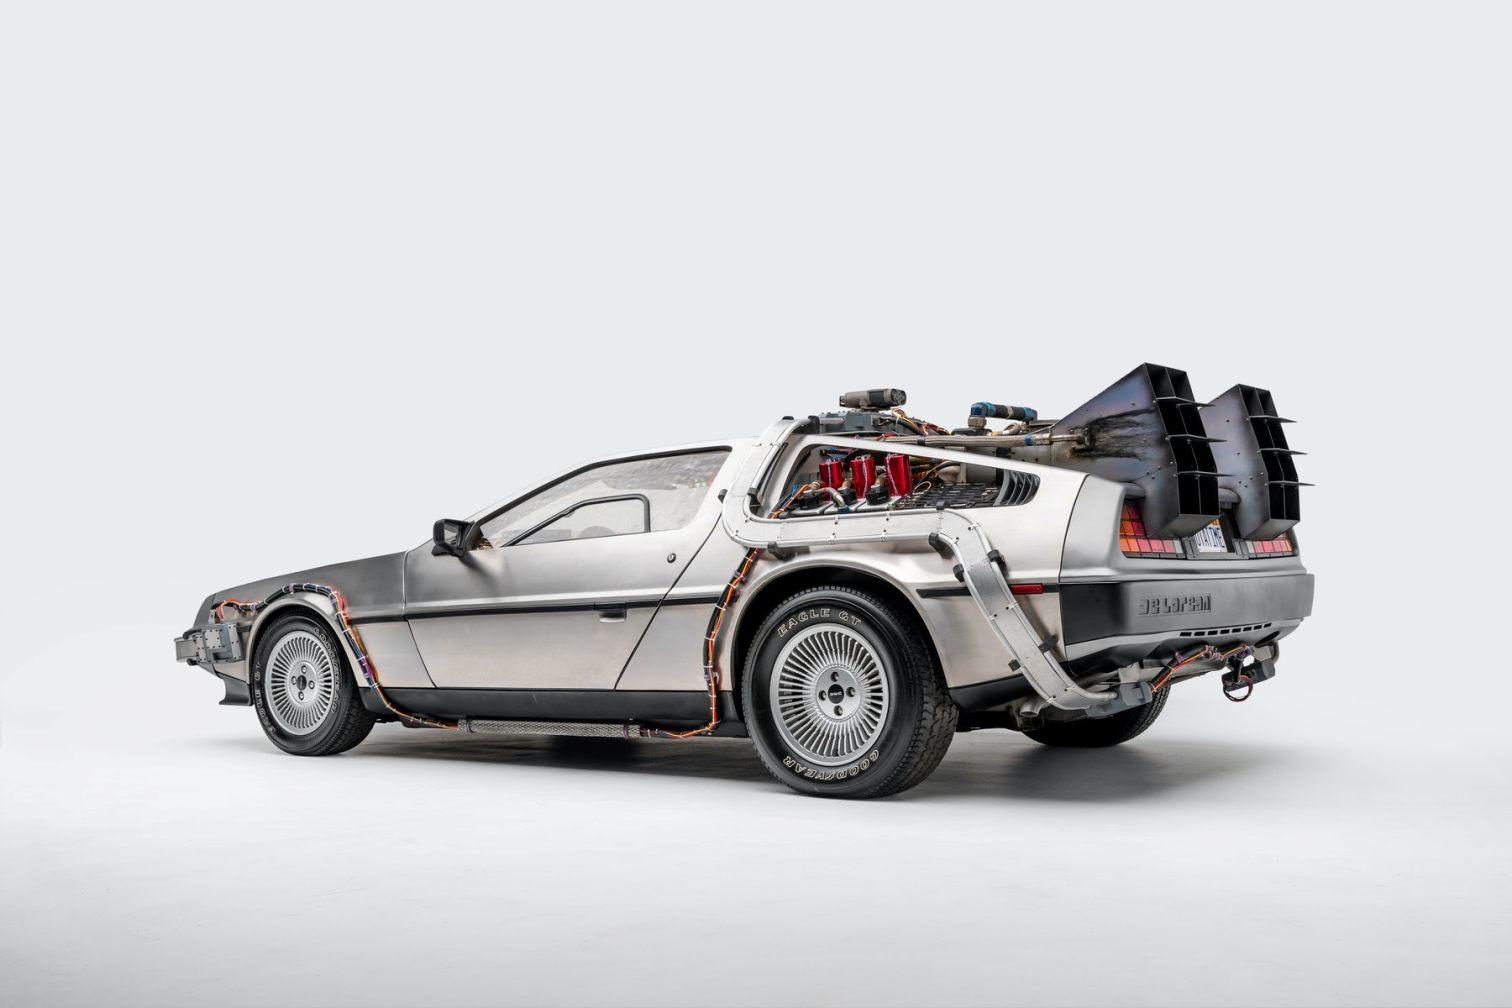 Hagerty Drivers Foundation 1981 DeLorean DMC